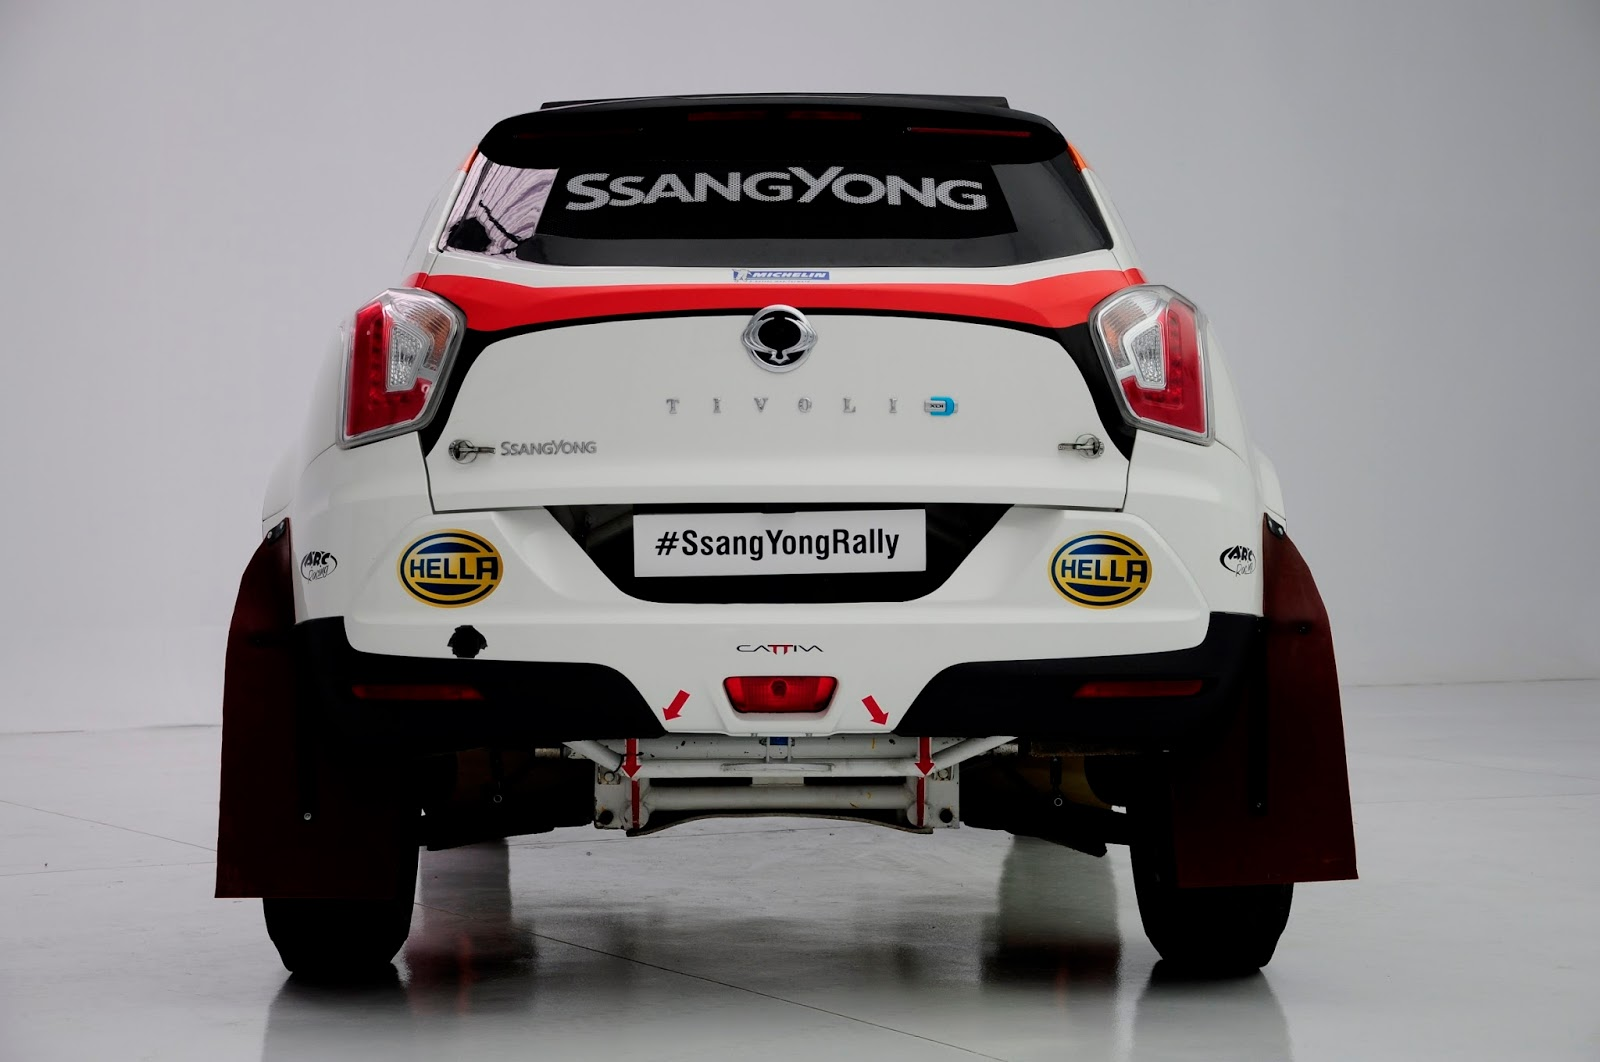 ssangyong-tivoli-rally-4-wd-autonovosti-me-4